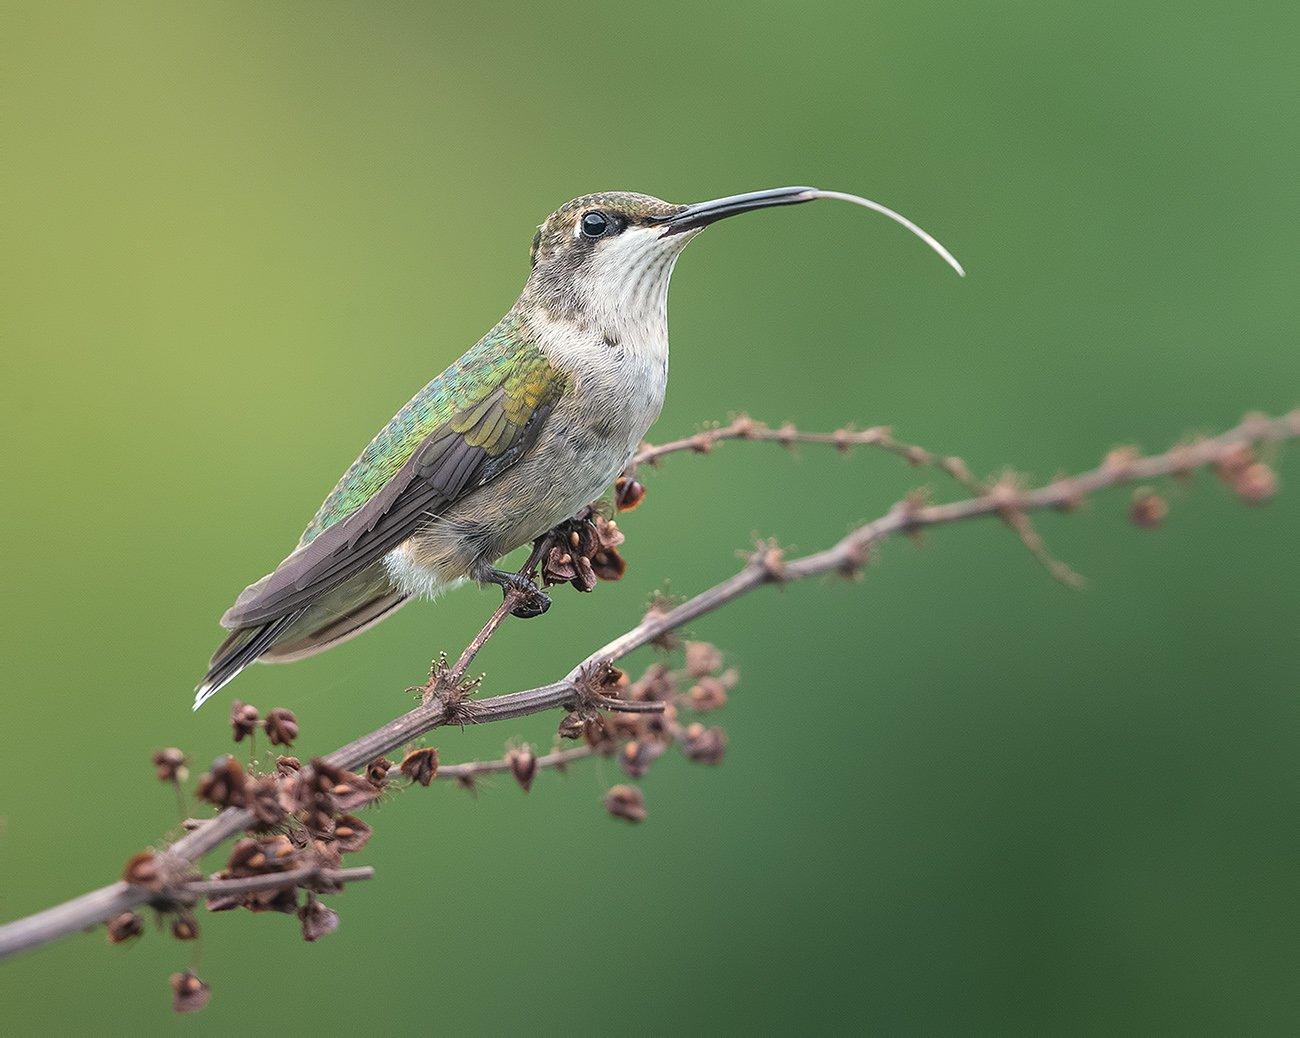 колибри, ruby-throated hummingbird, hummingbird, Elizabeth E